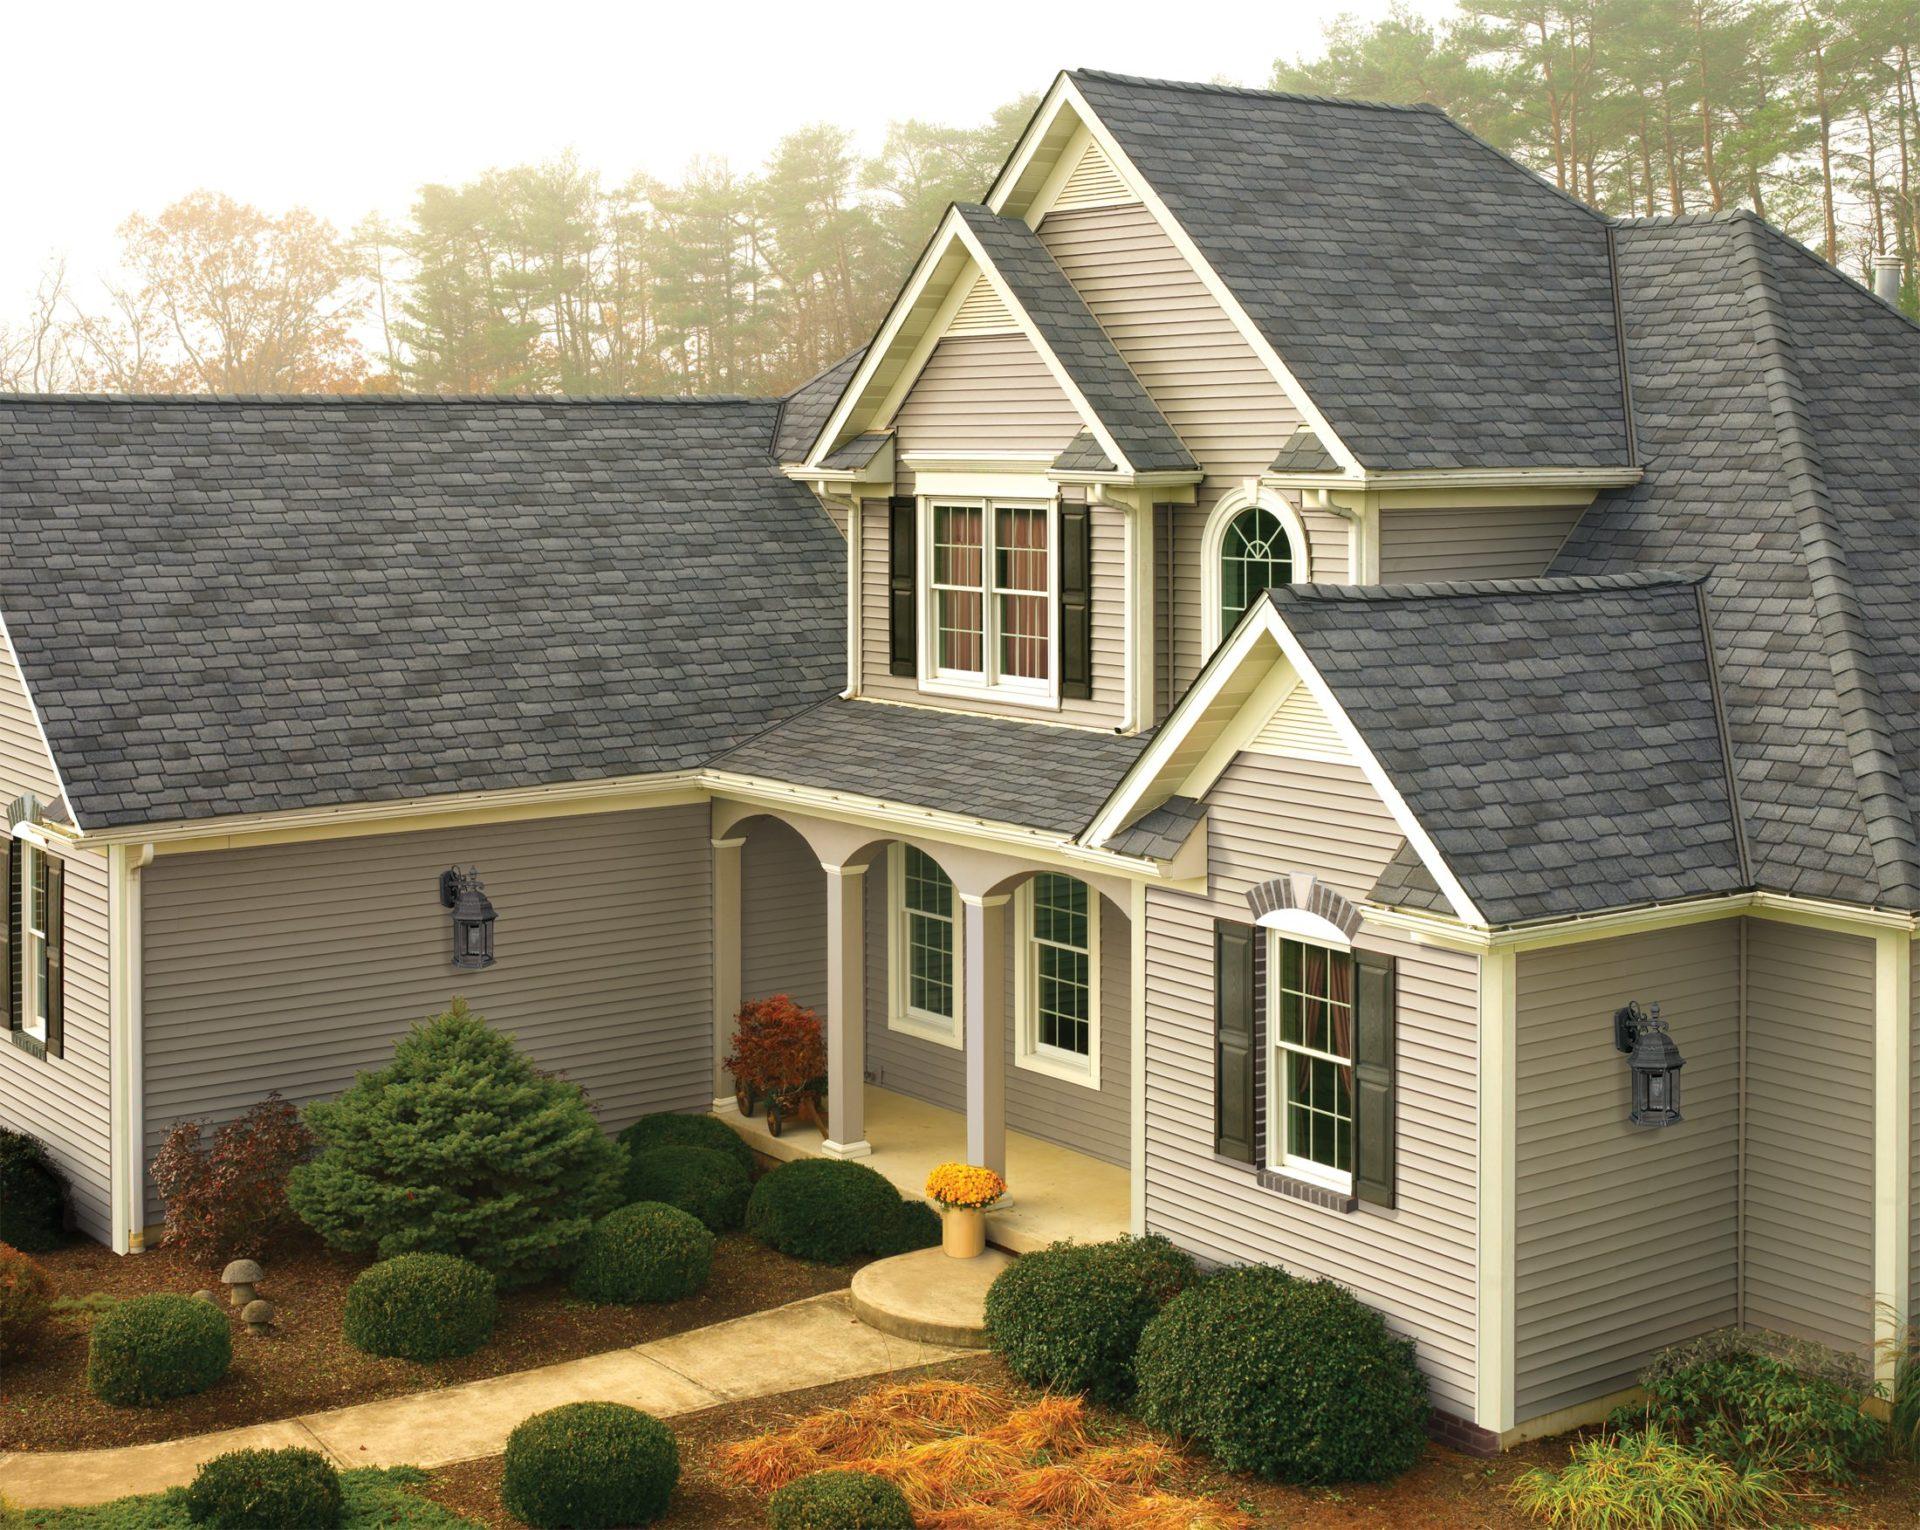 Gaf Woodland Castlewood Grey Brinkmann Quality Roofing